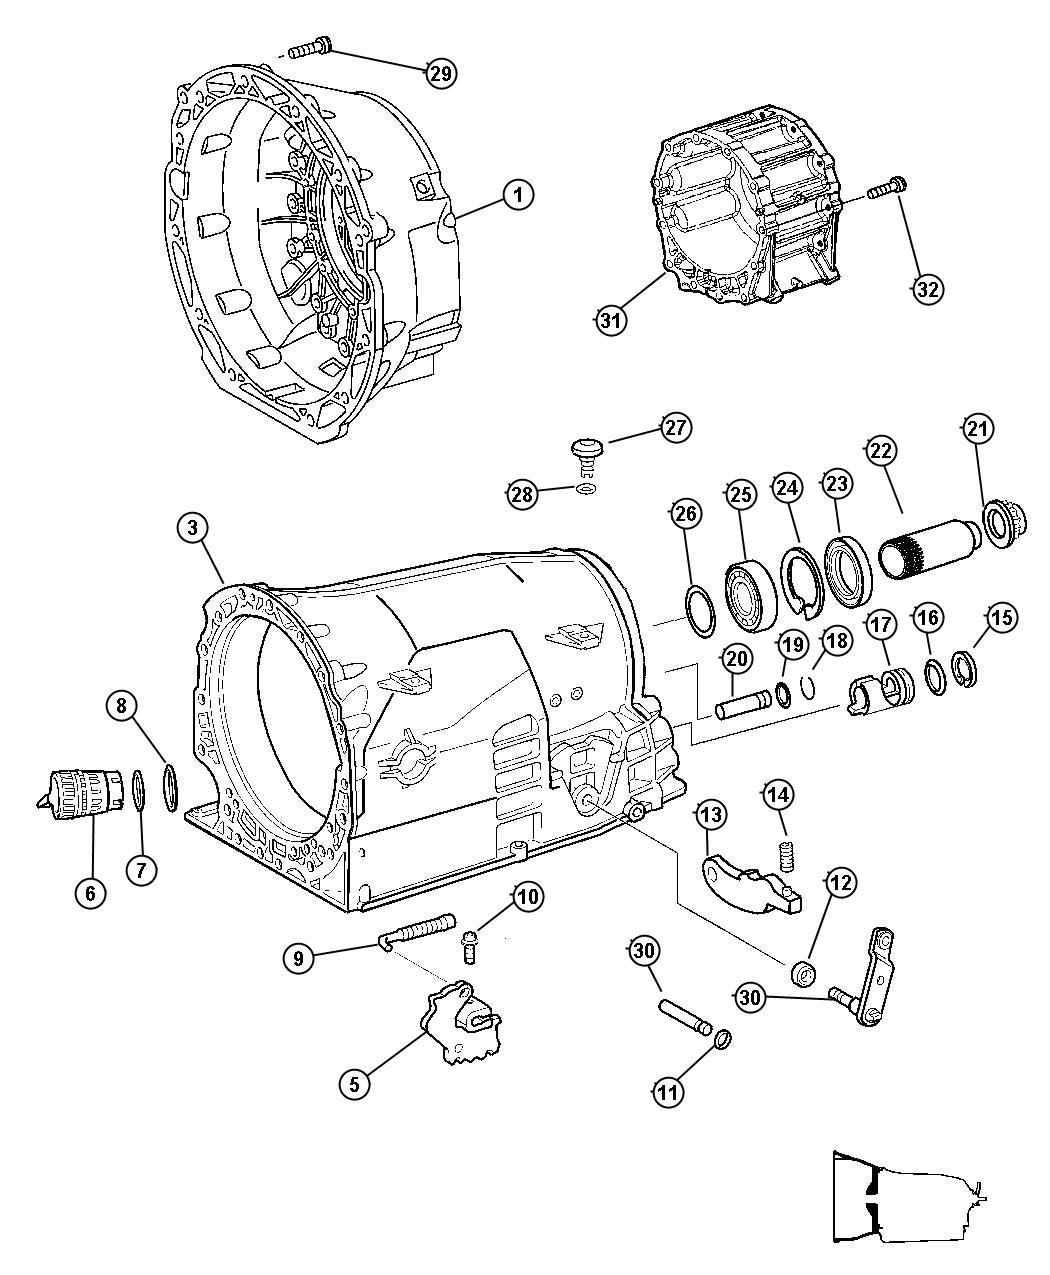 Chrysler 300 Breather Transmission Case Related